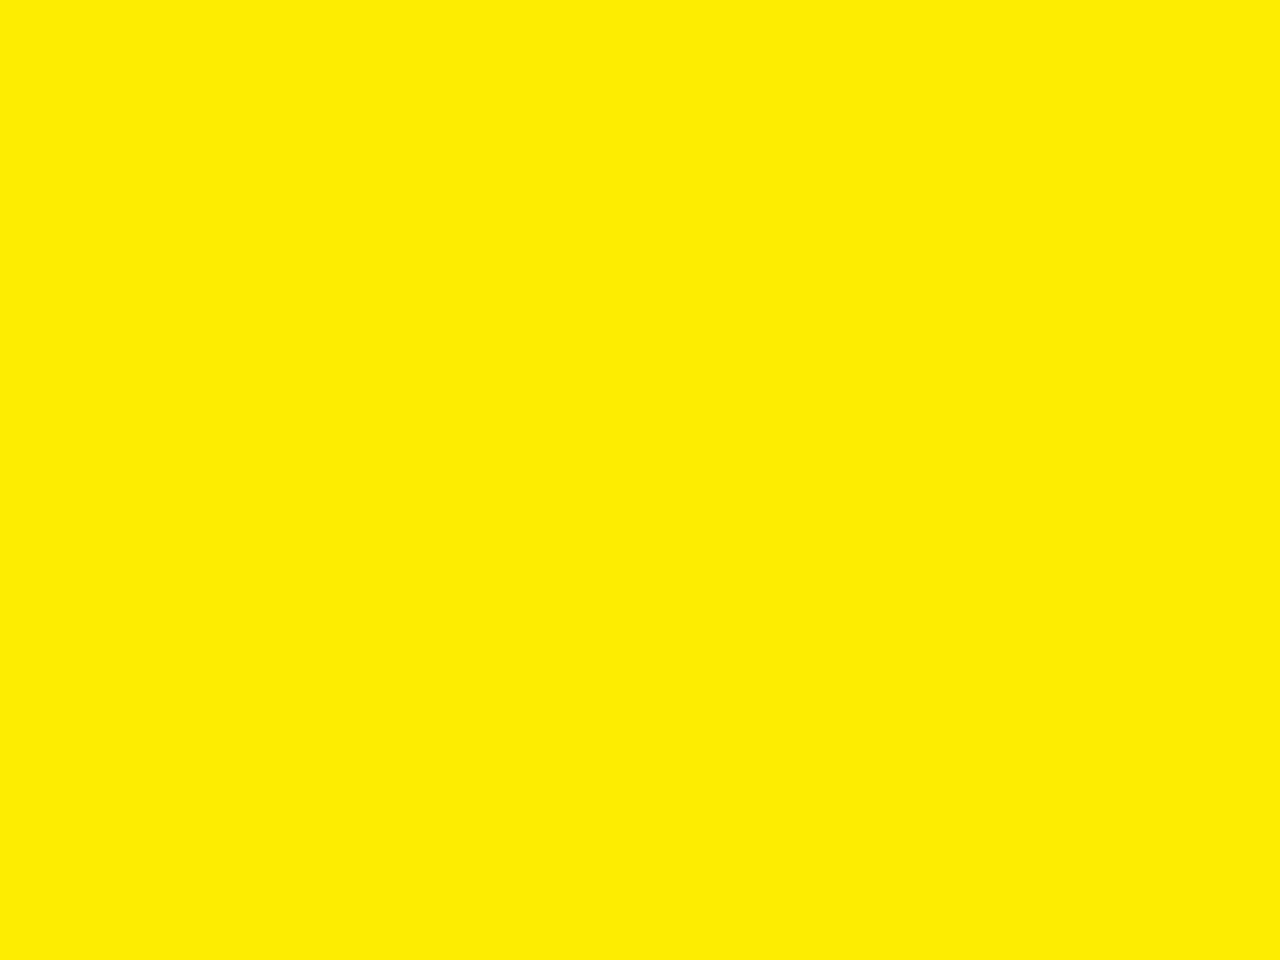 1280x960 Aureolin Solid Color Background